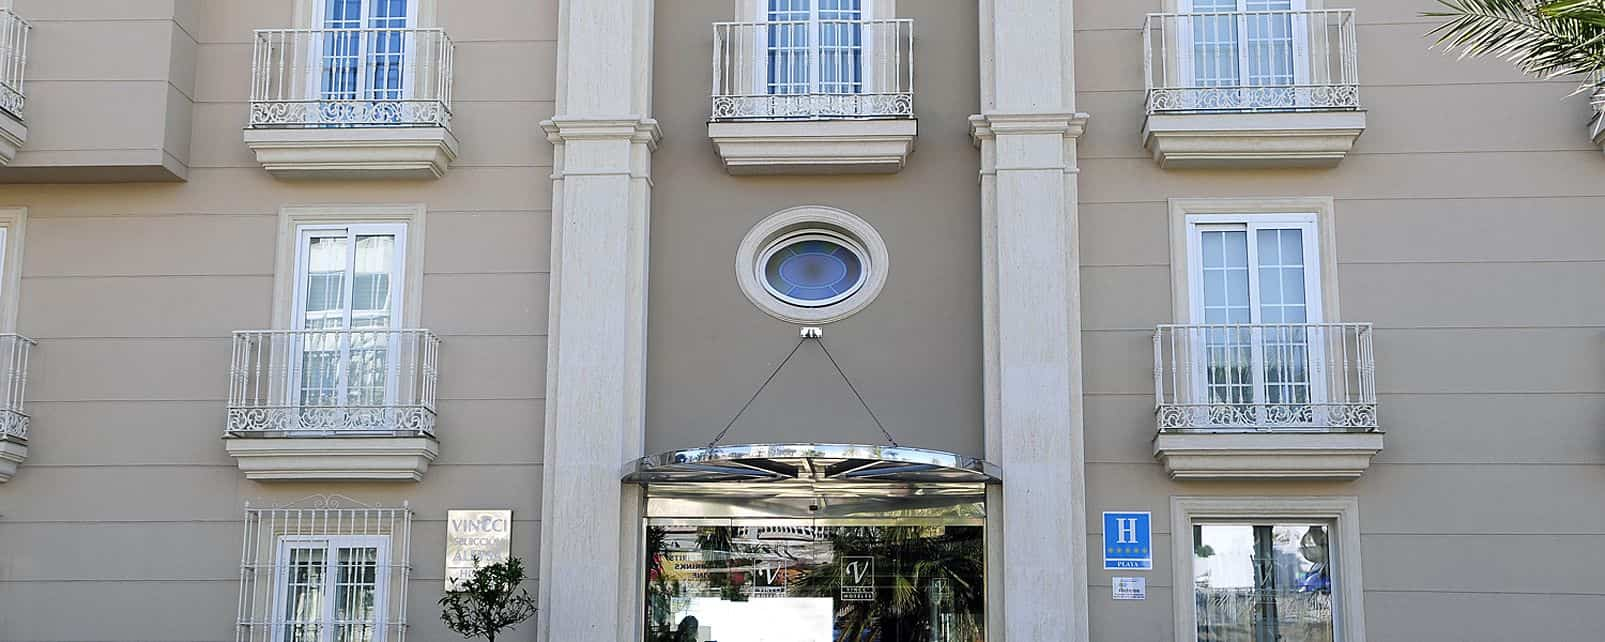 vincci-aleysa-boutique hotel in Benalmádena